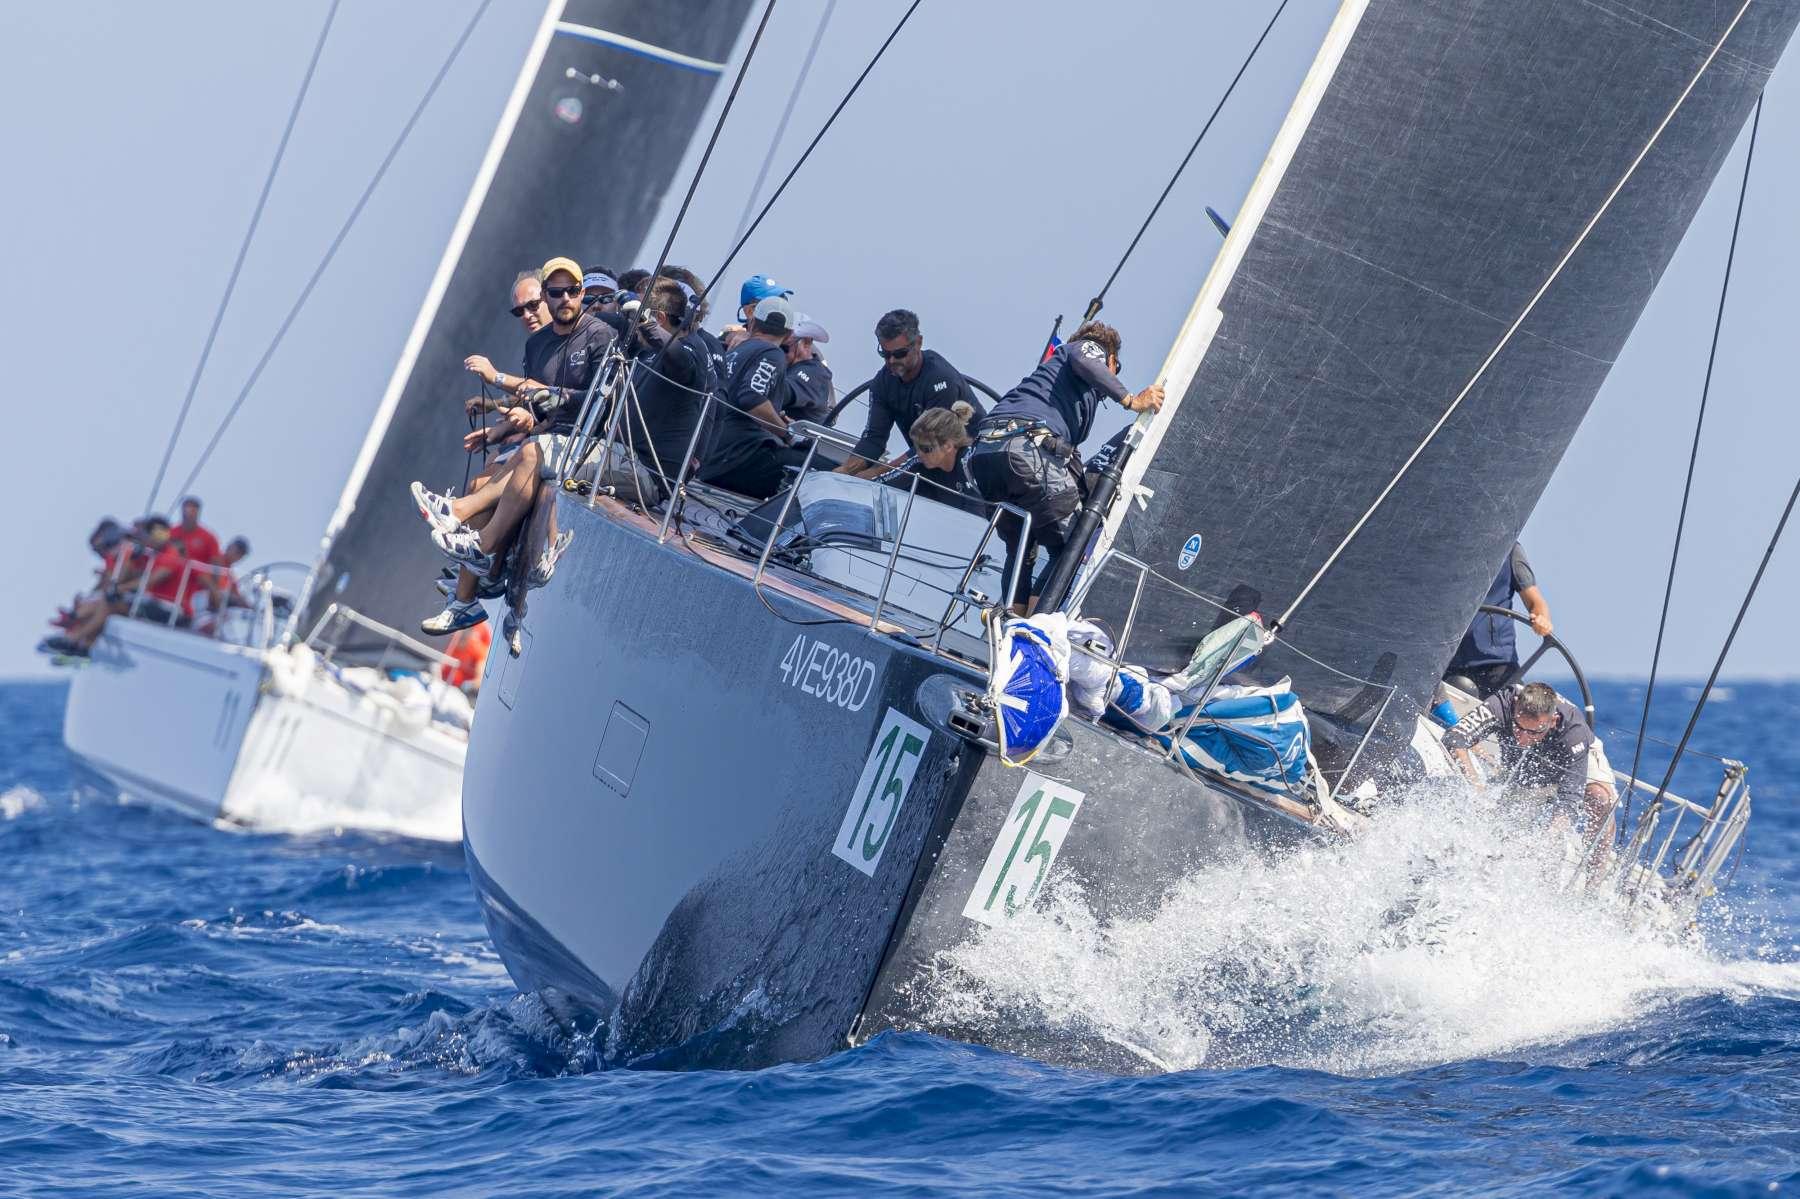 MAXI YACHT ROLEX CUP 2019 - FOTO DAY 2 ONLINE - NEWS - Yacht Club Costa Smeralda